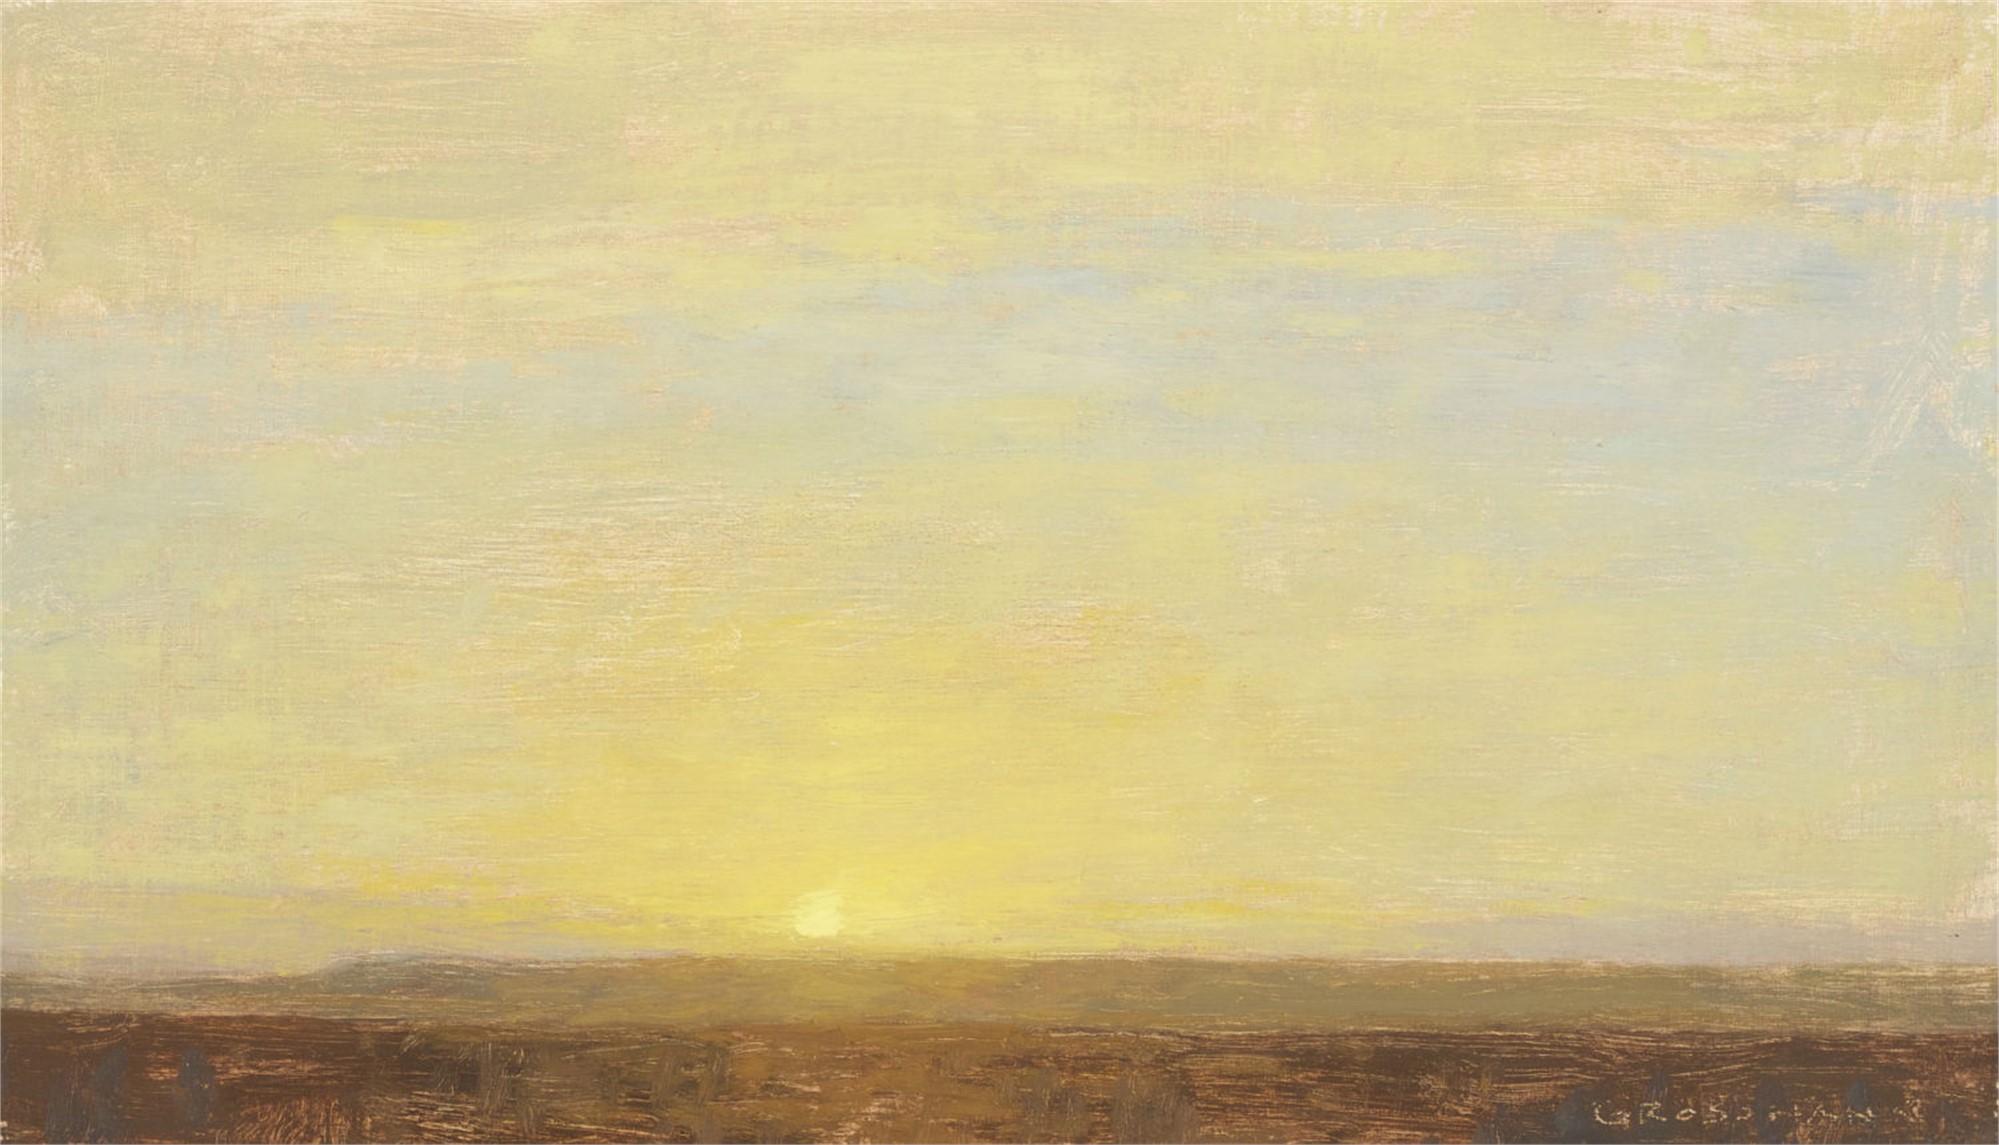 Solstice Sunrise by David Grossmann